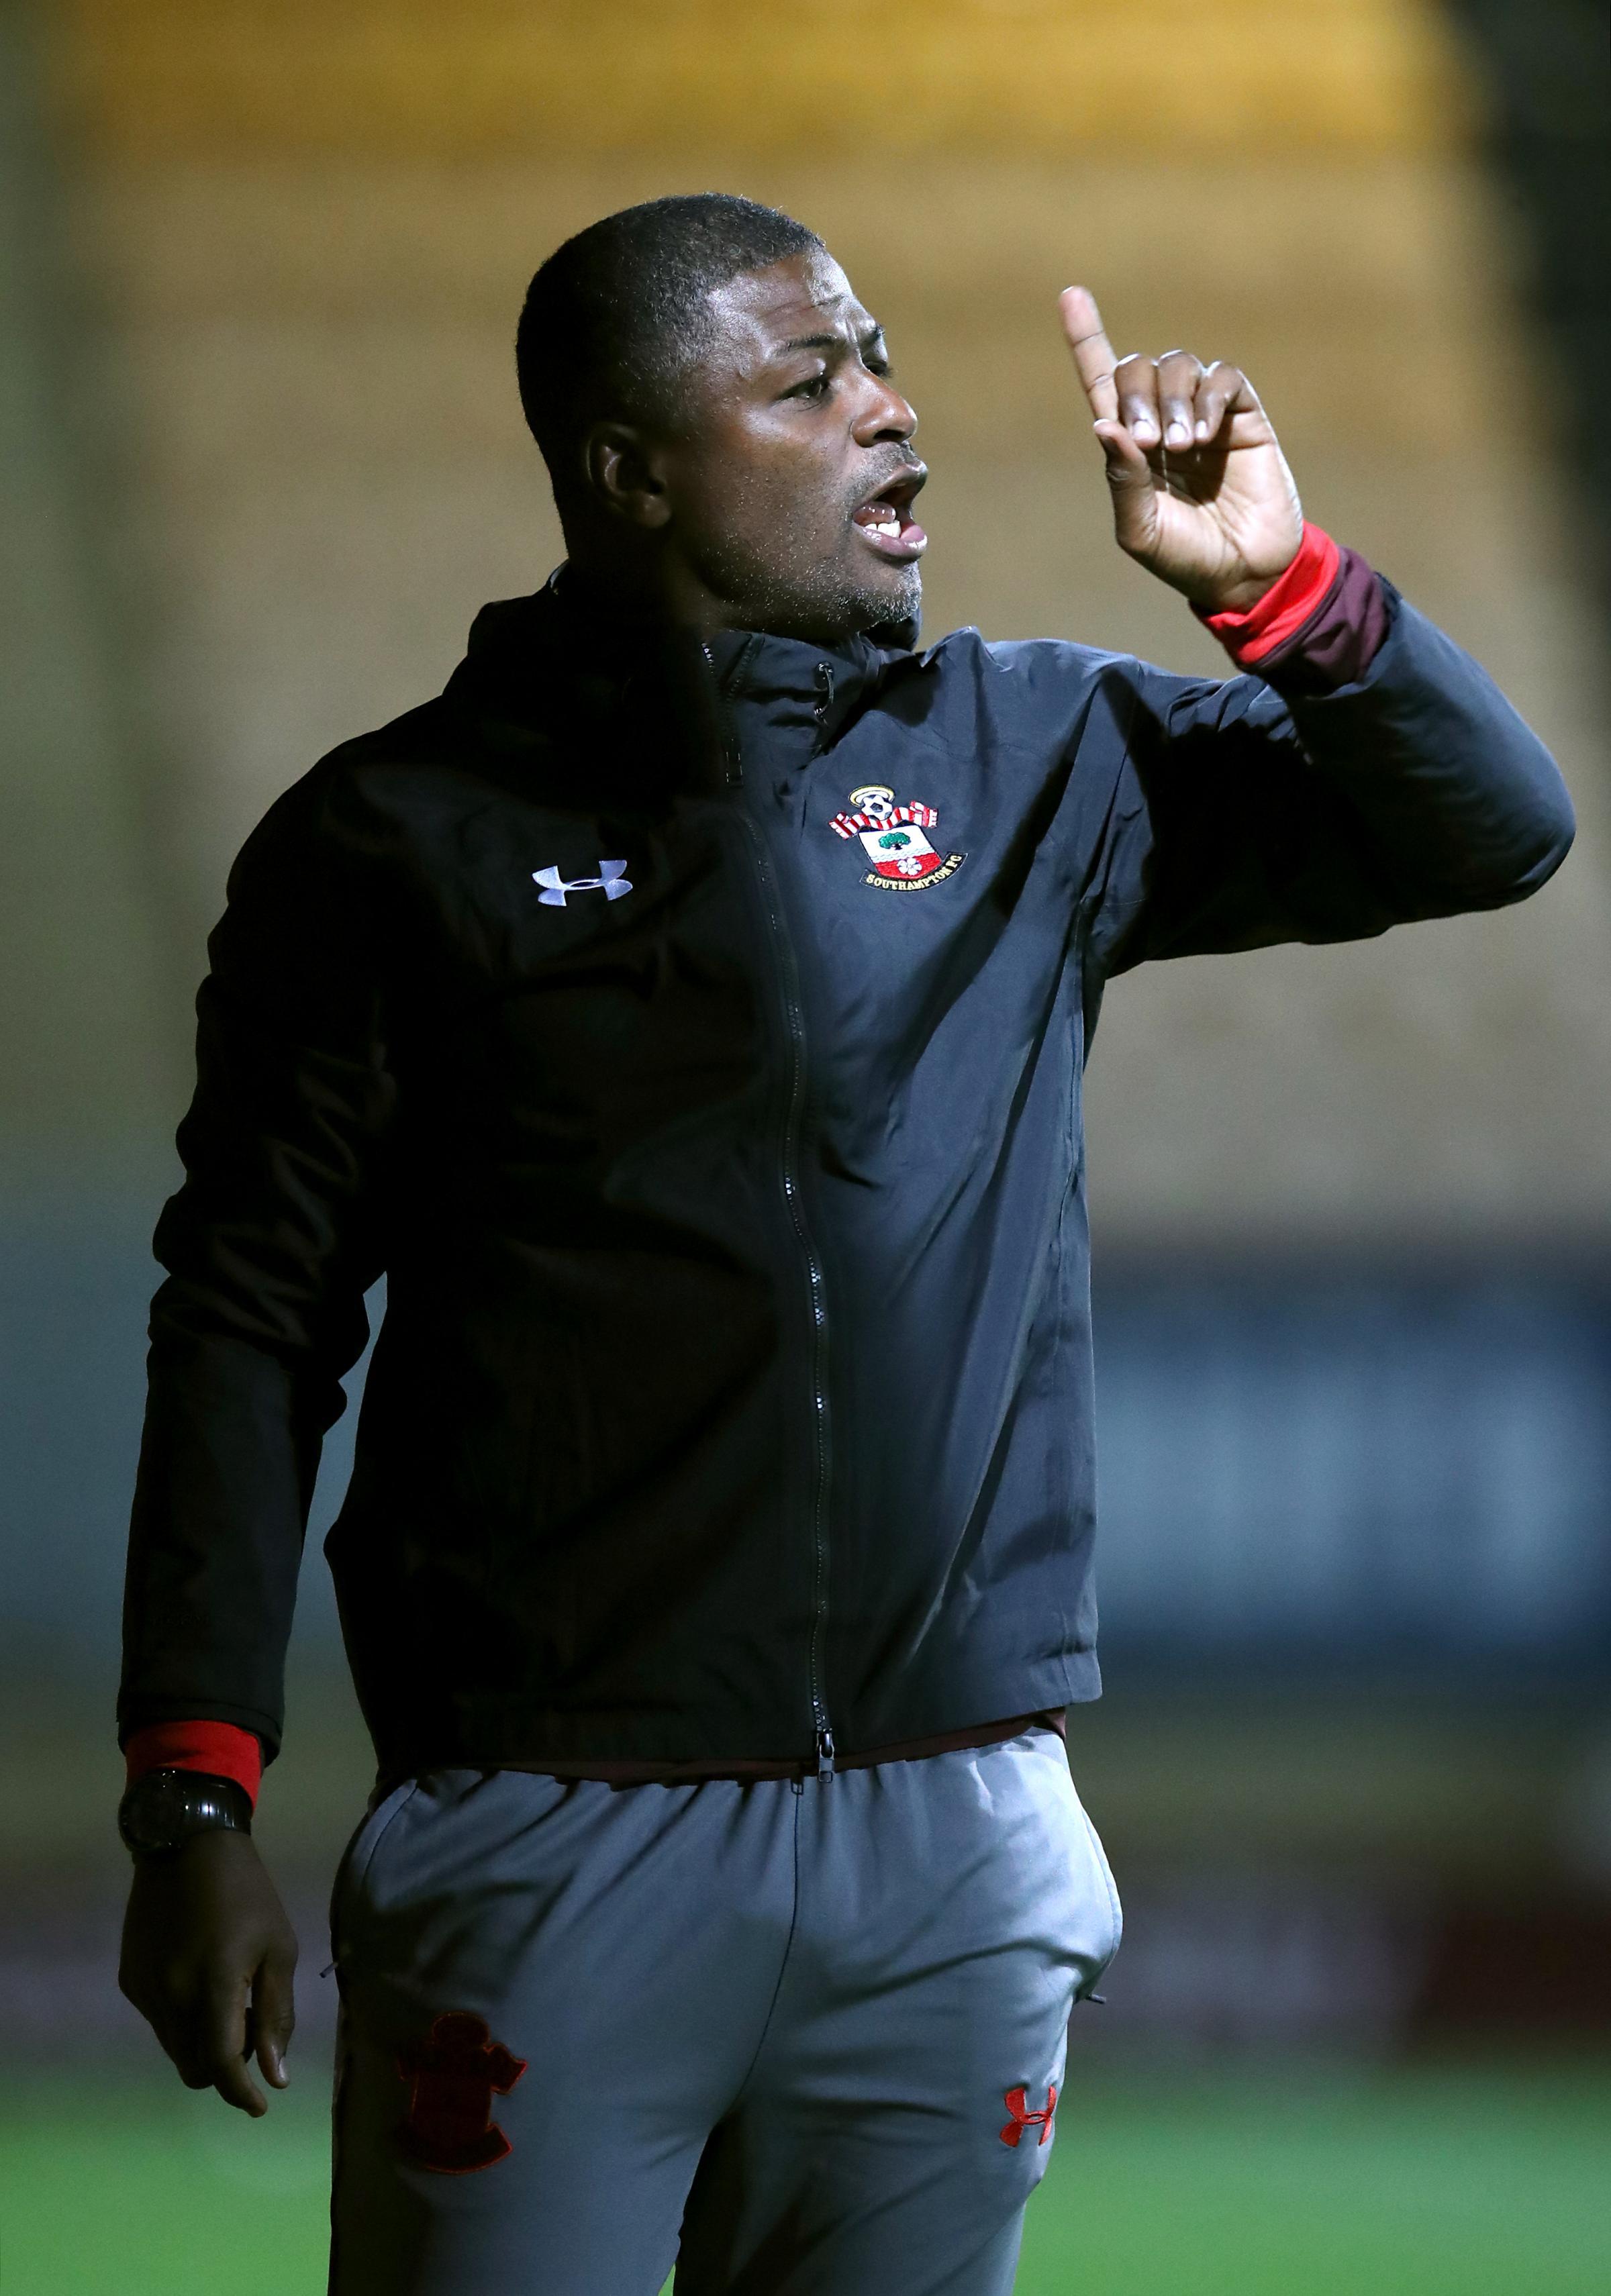 Jaidi backs his U23's to deal with the pressure